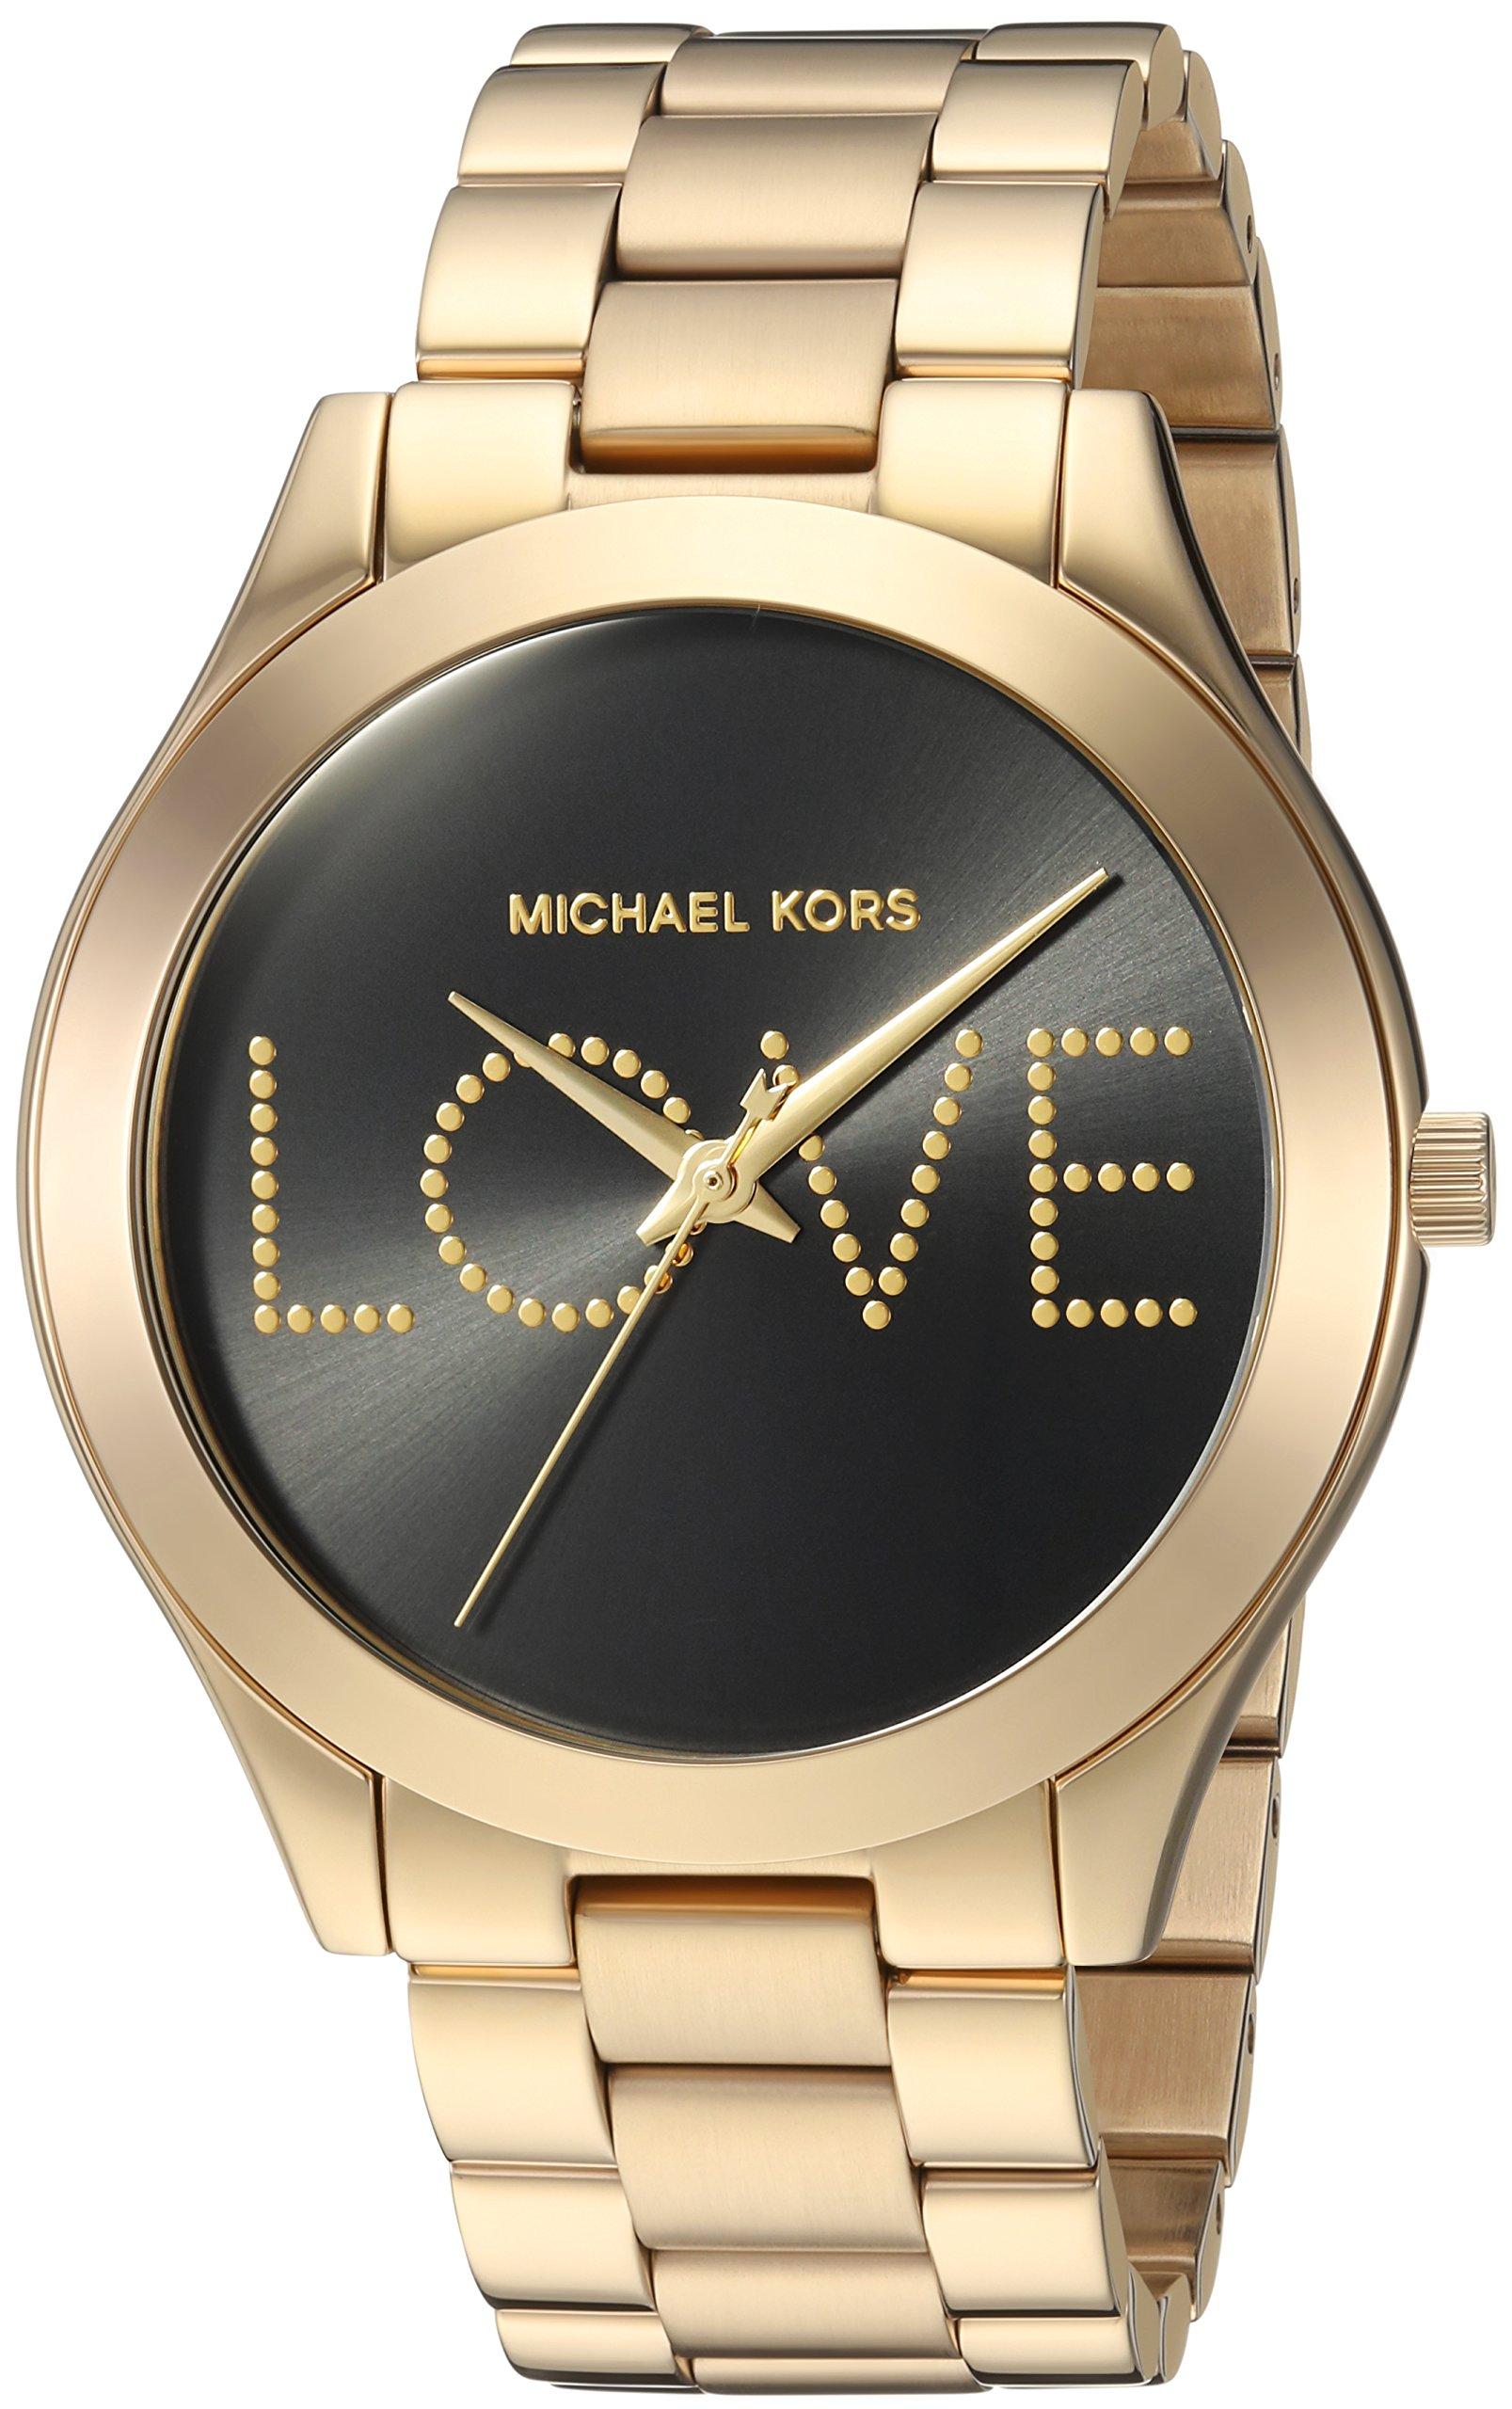 Michael Kors Women's 'Slim Runway' Quartz Stainless Steel Casual Watch, Color:Gold-Toned (Model: MK3803)